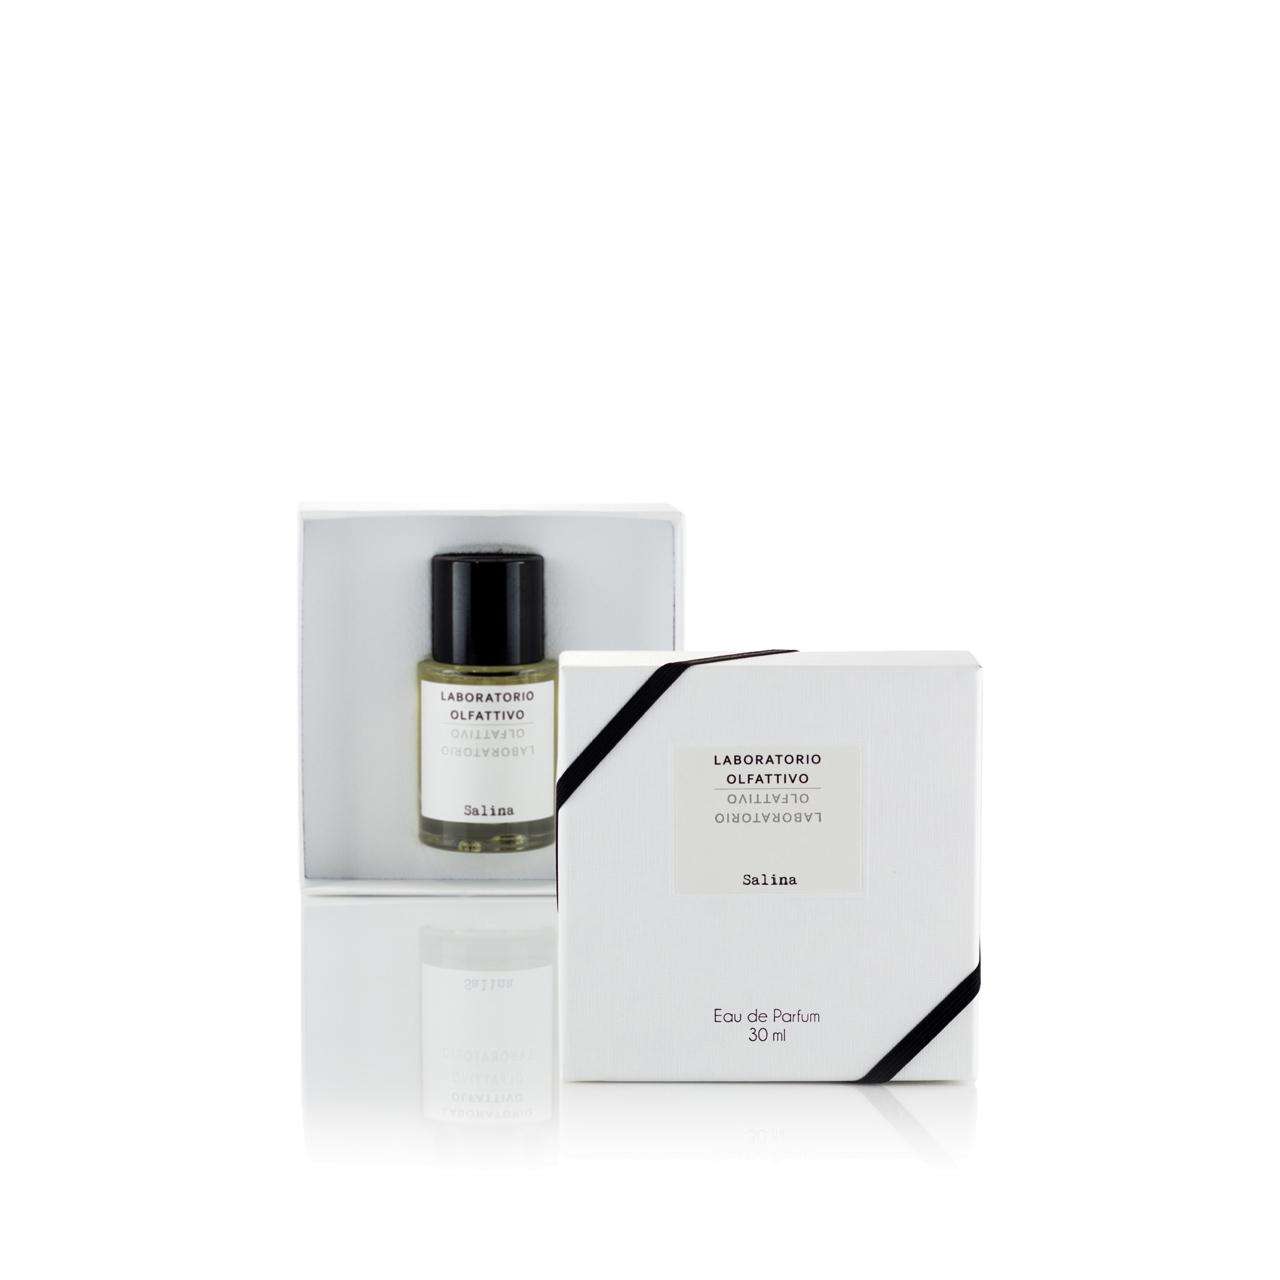 Salina - Eau de Parfum